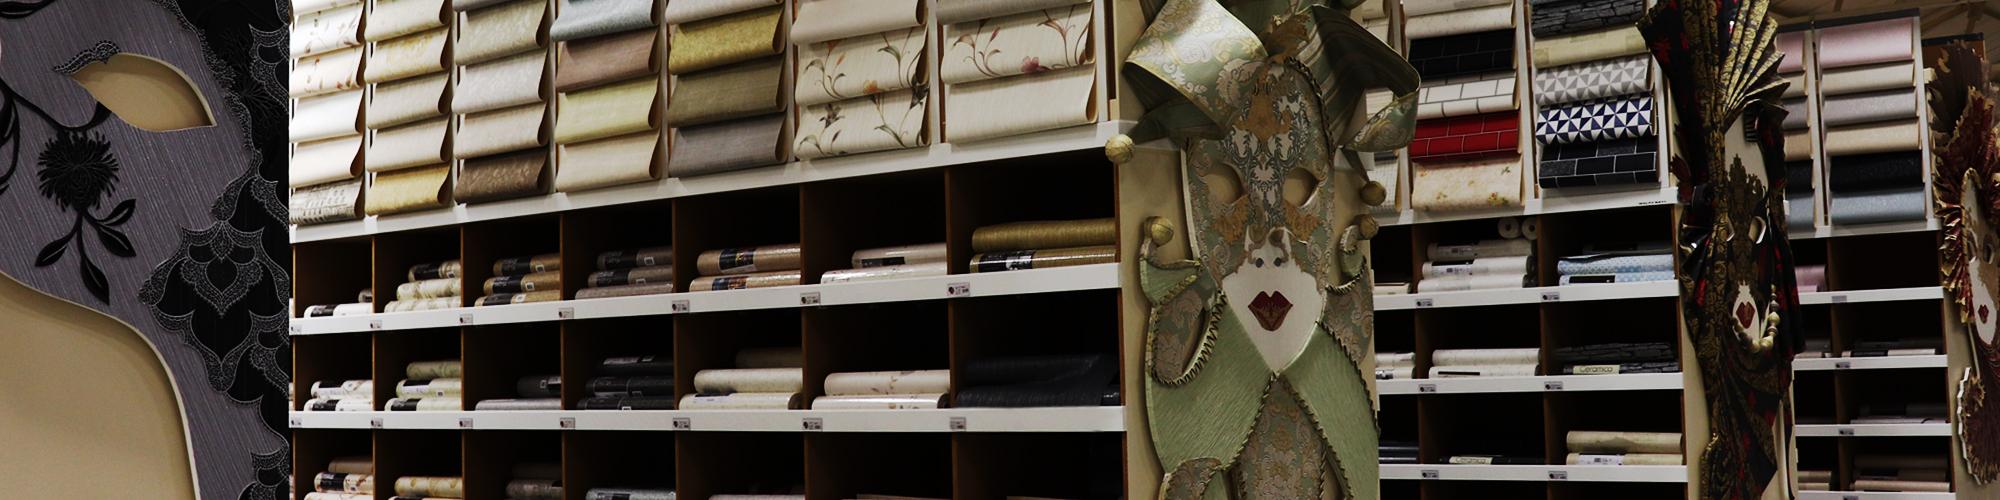 Wallpaper, gallery, designer wallpaper, patterned wallpaper, wallpaper suppliers